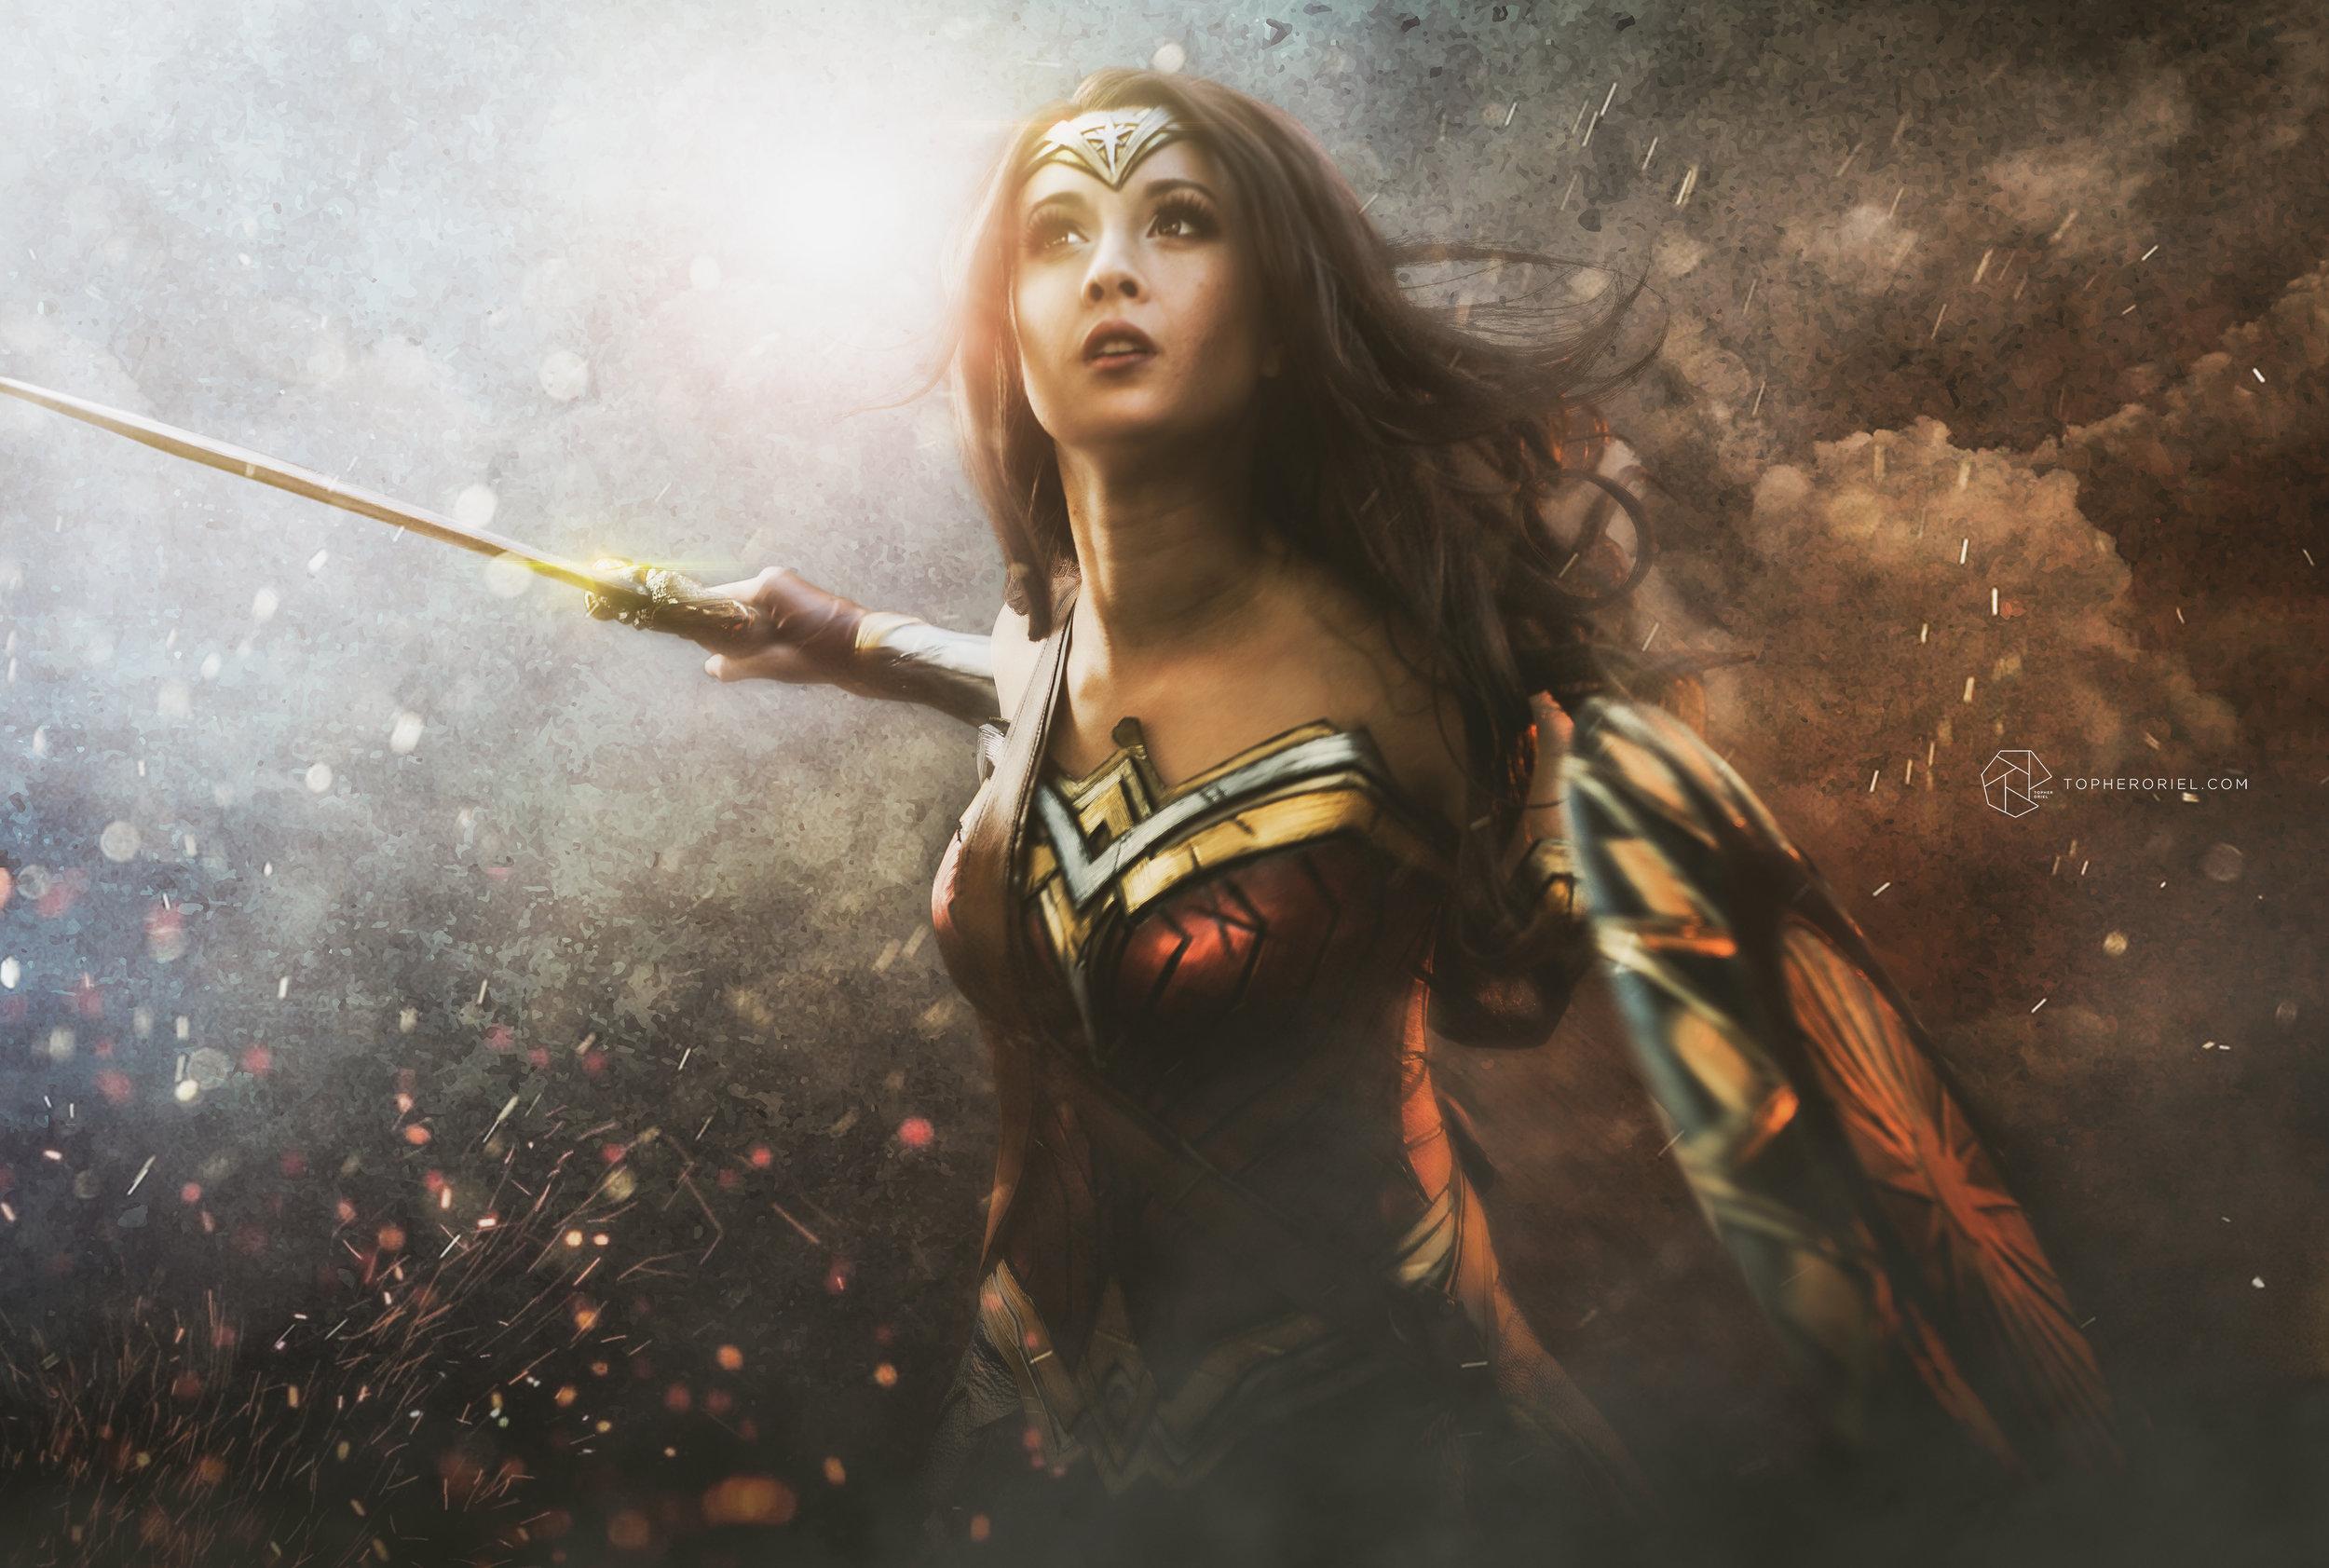 wonderwoman-composite1.jpg